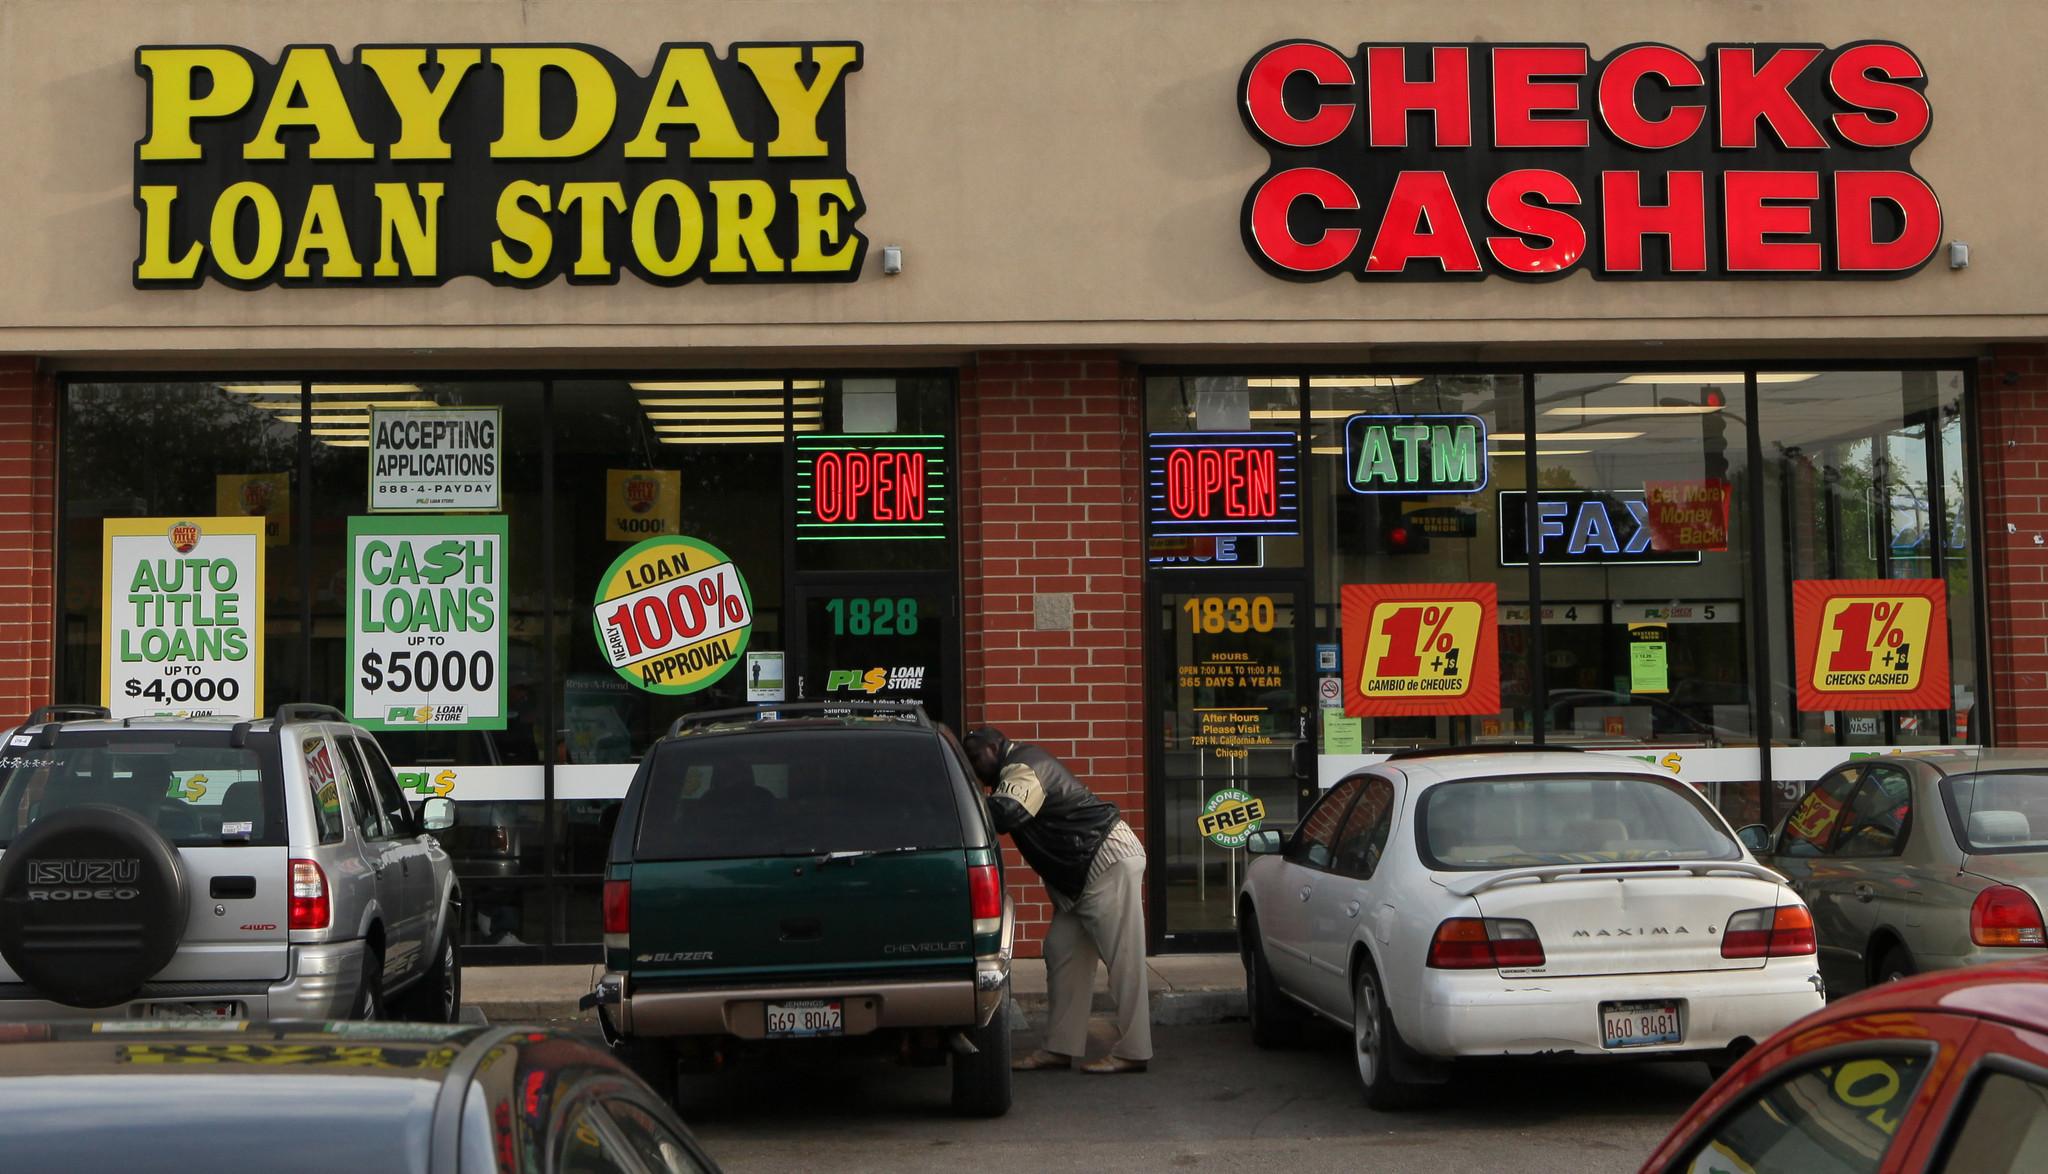 Chase slate cash advance limit picture 4